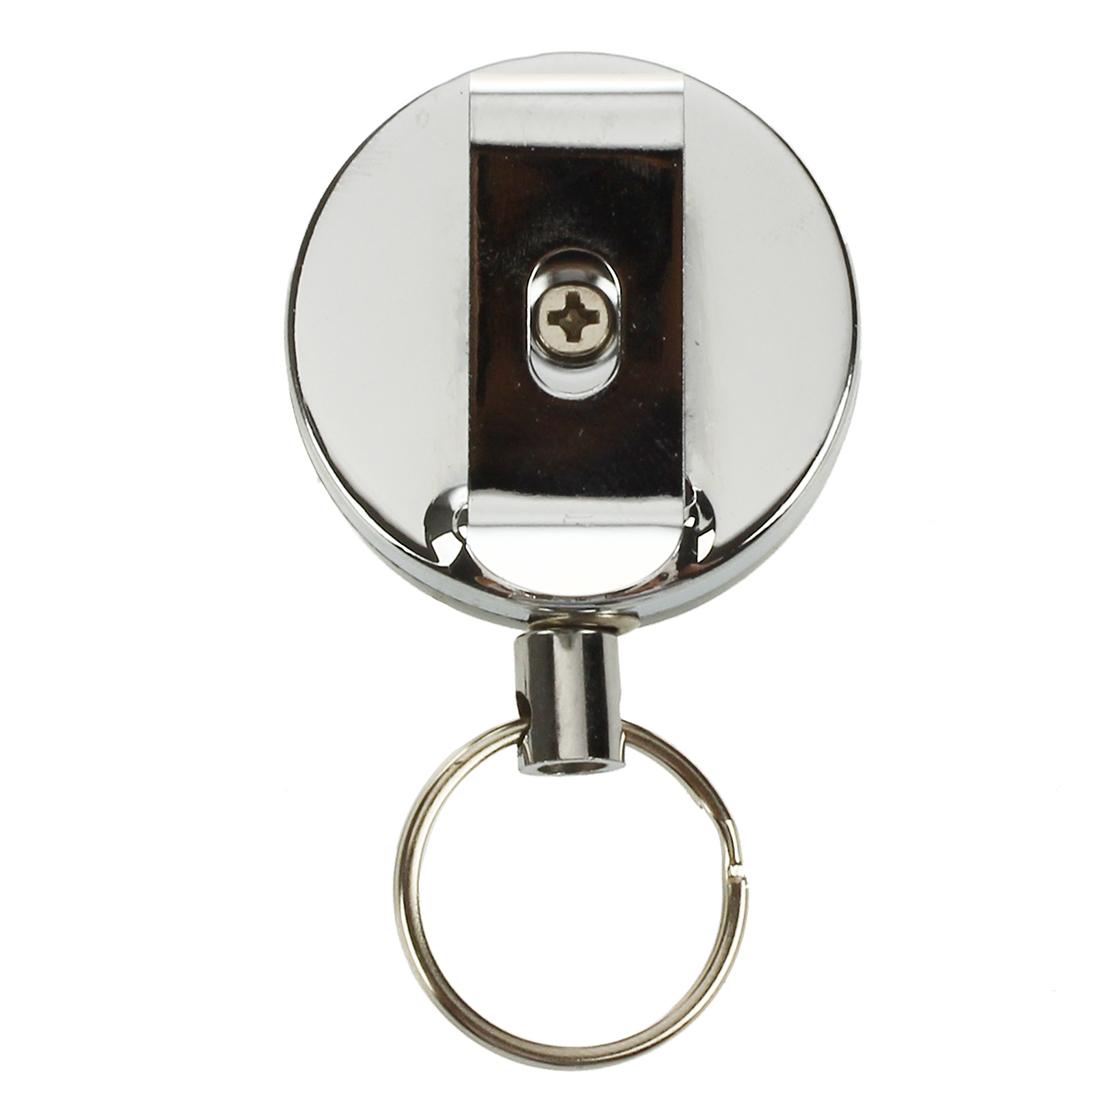 mini dispositif antivol crochet de securite pour portefeuille c1k3 ebay. Black Bedroom Furniture Sets. Home Design Ideas